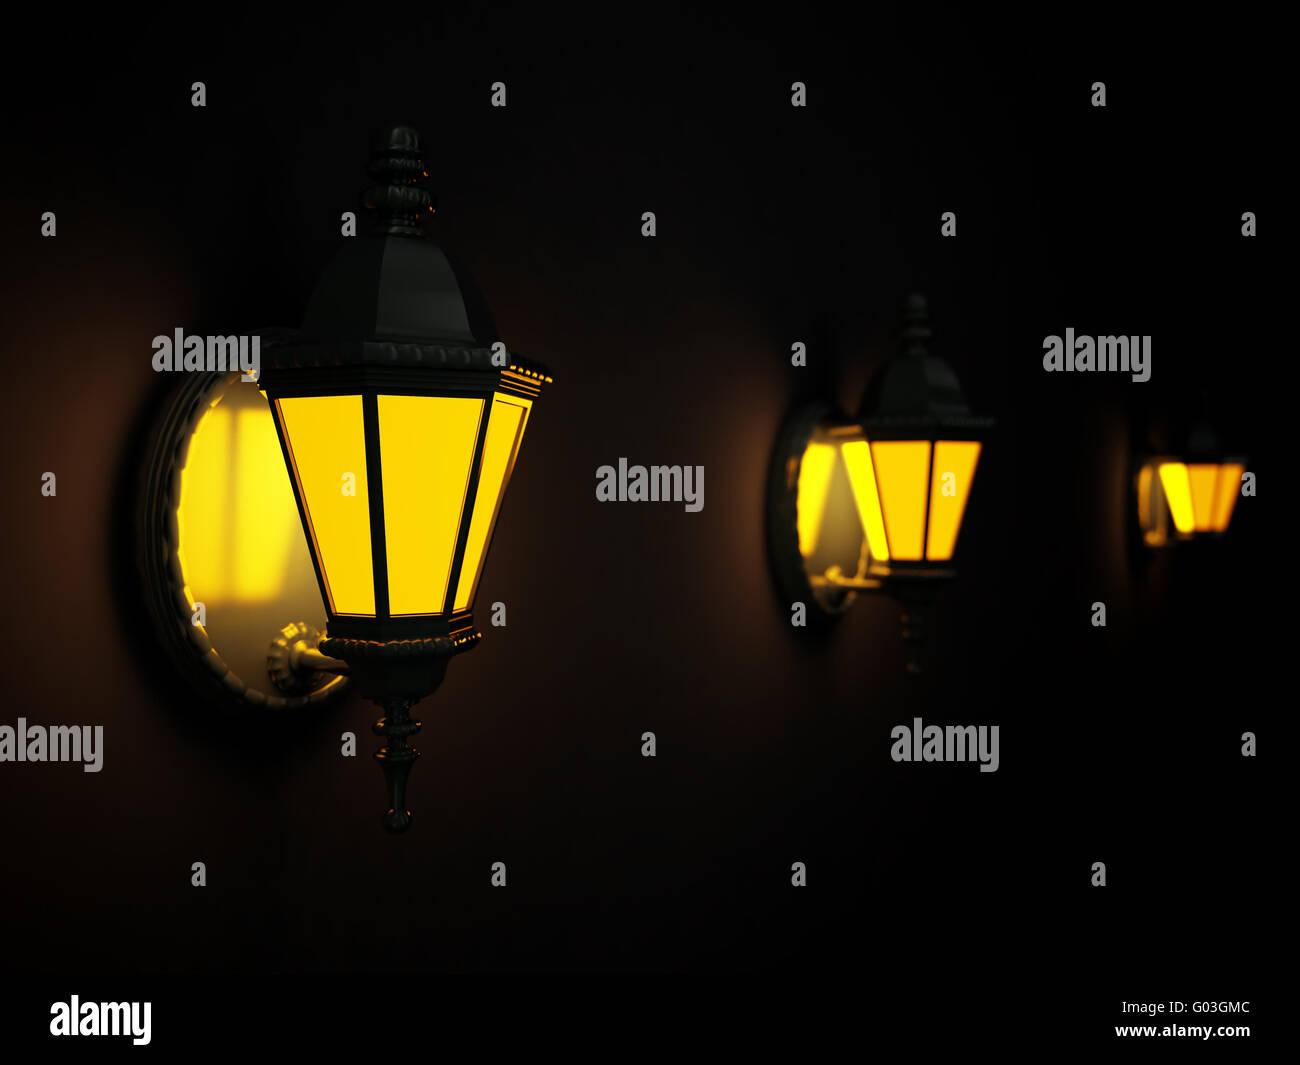 Shone street lanterns on a wall at dark night - Stock Image